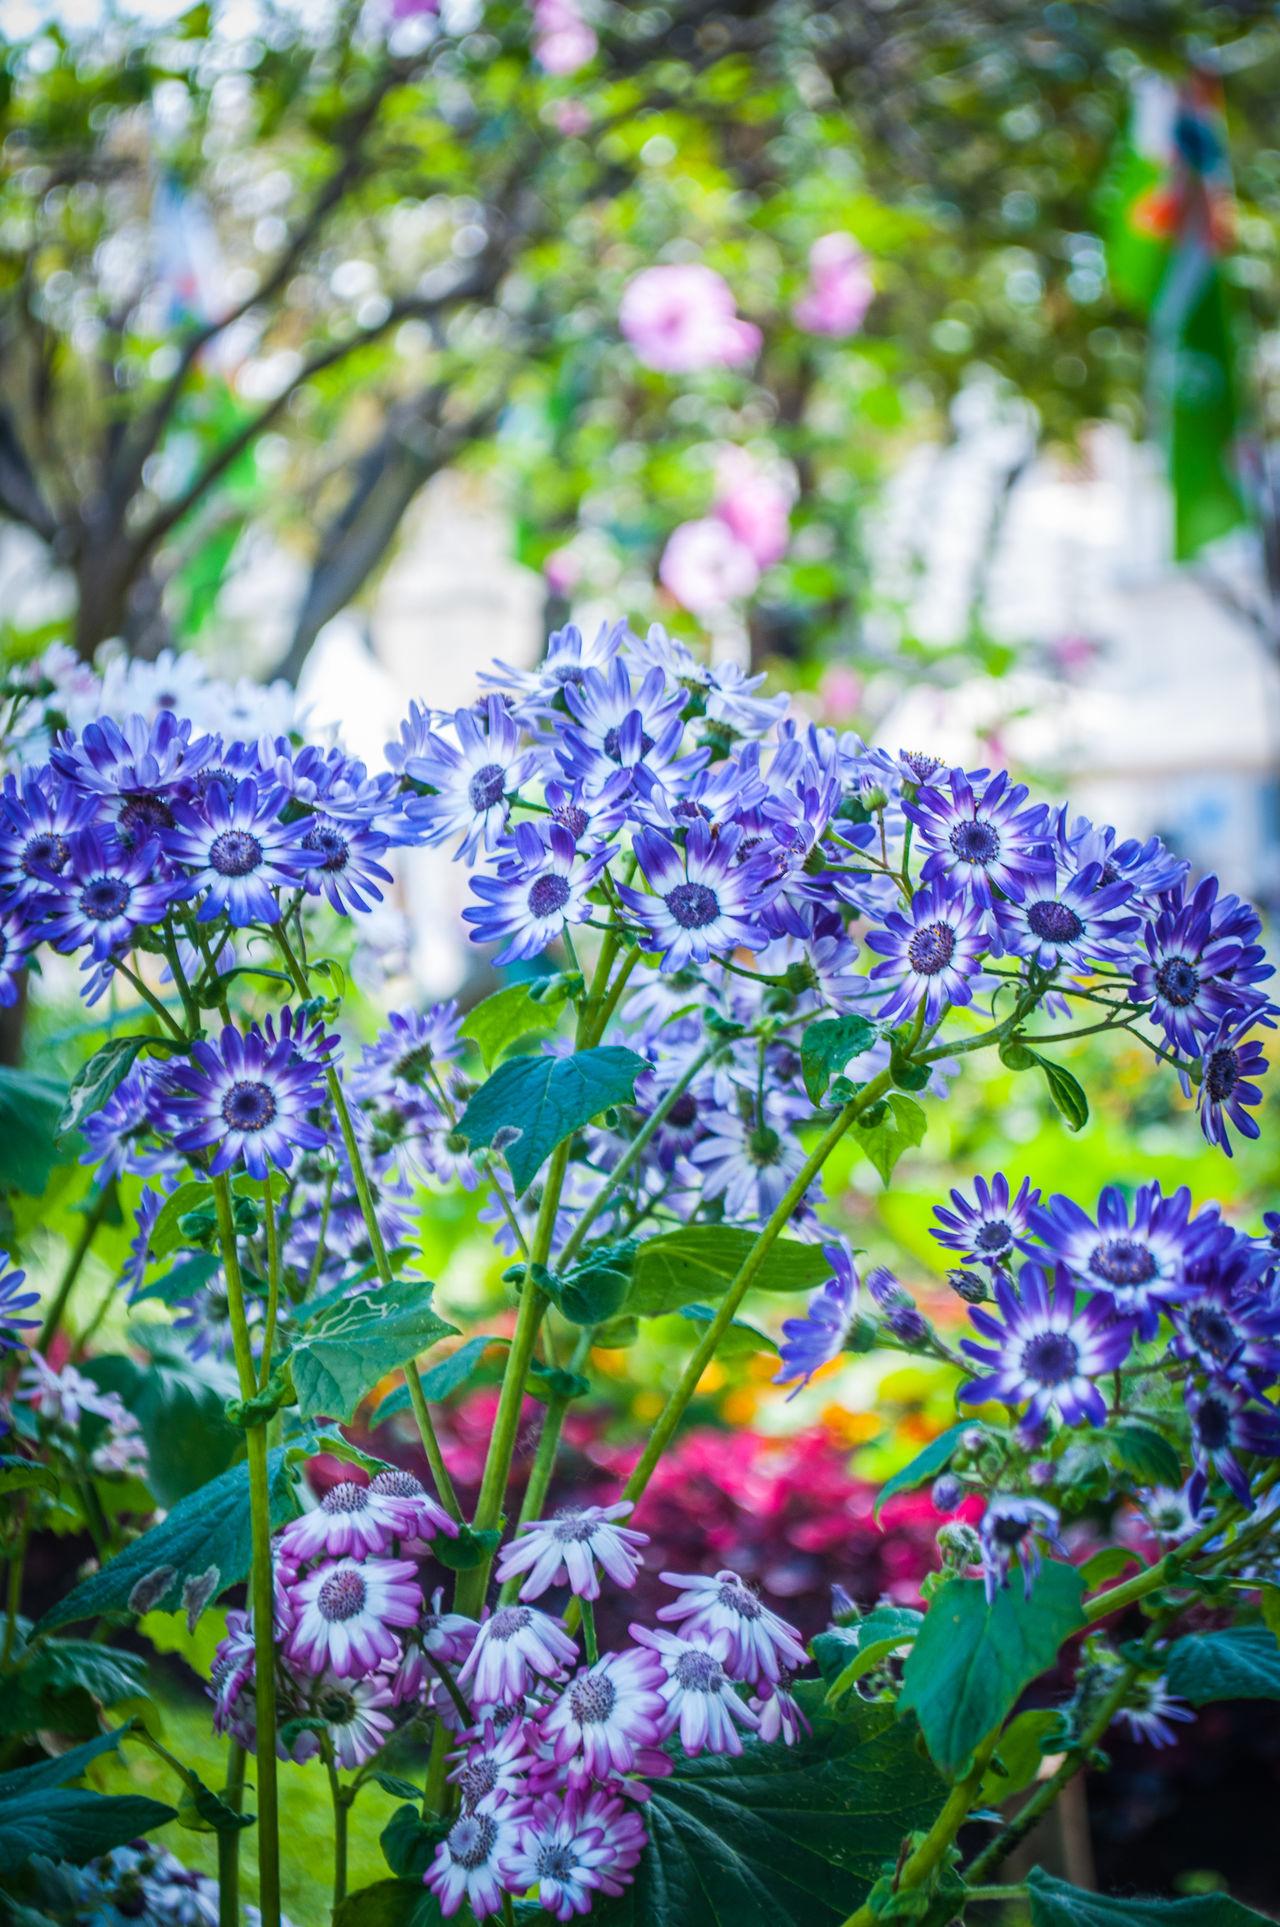 #flower#garden#nature#ecuador#santodomingoecuador#eyeEmfollowers#iphoneonly#nofiltrer#macro_garden#pretty#beautiful#followme#sho #igersportugal #morado #naturalbeauty #Nature  #portugal #pétalos #turismo